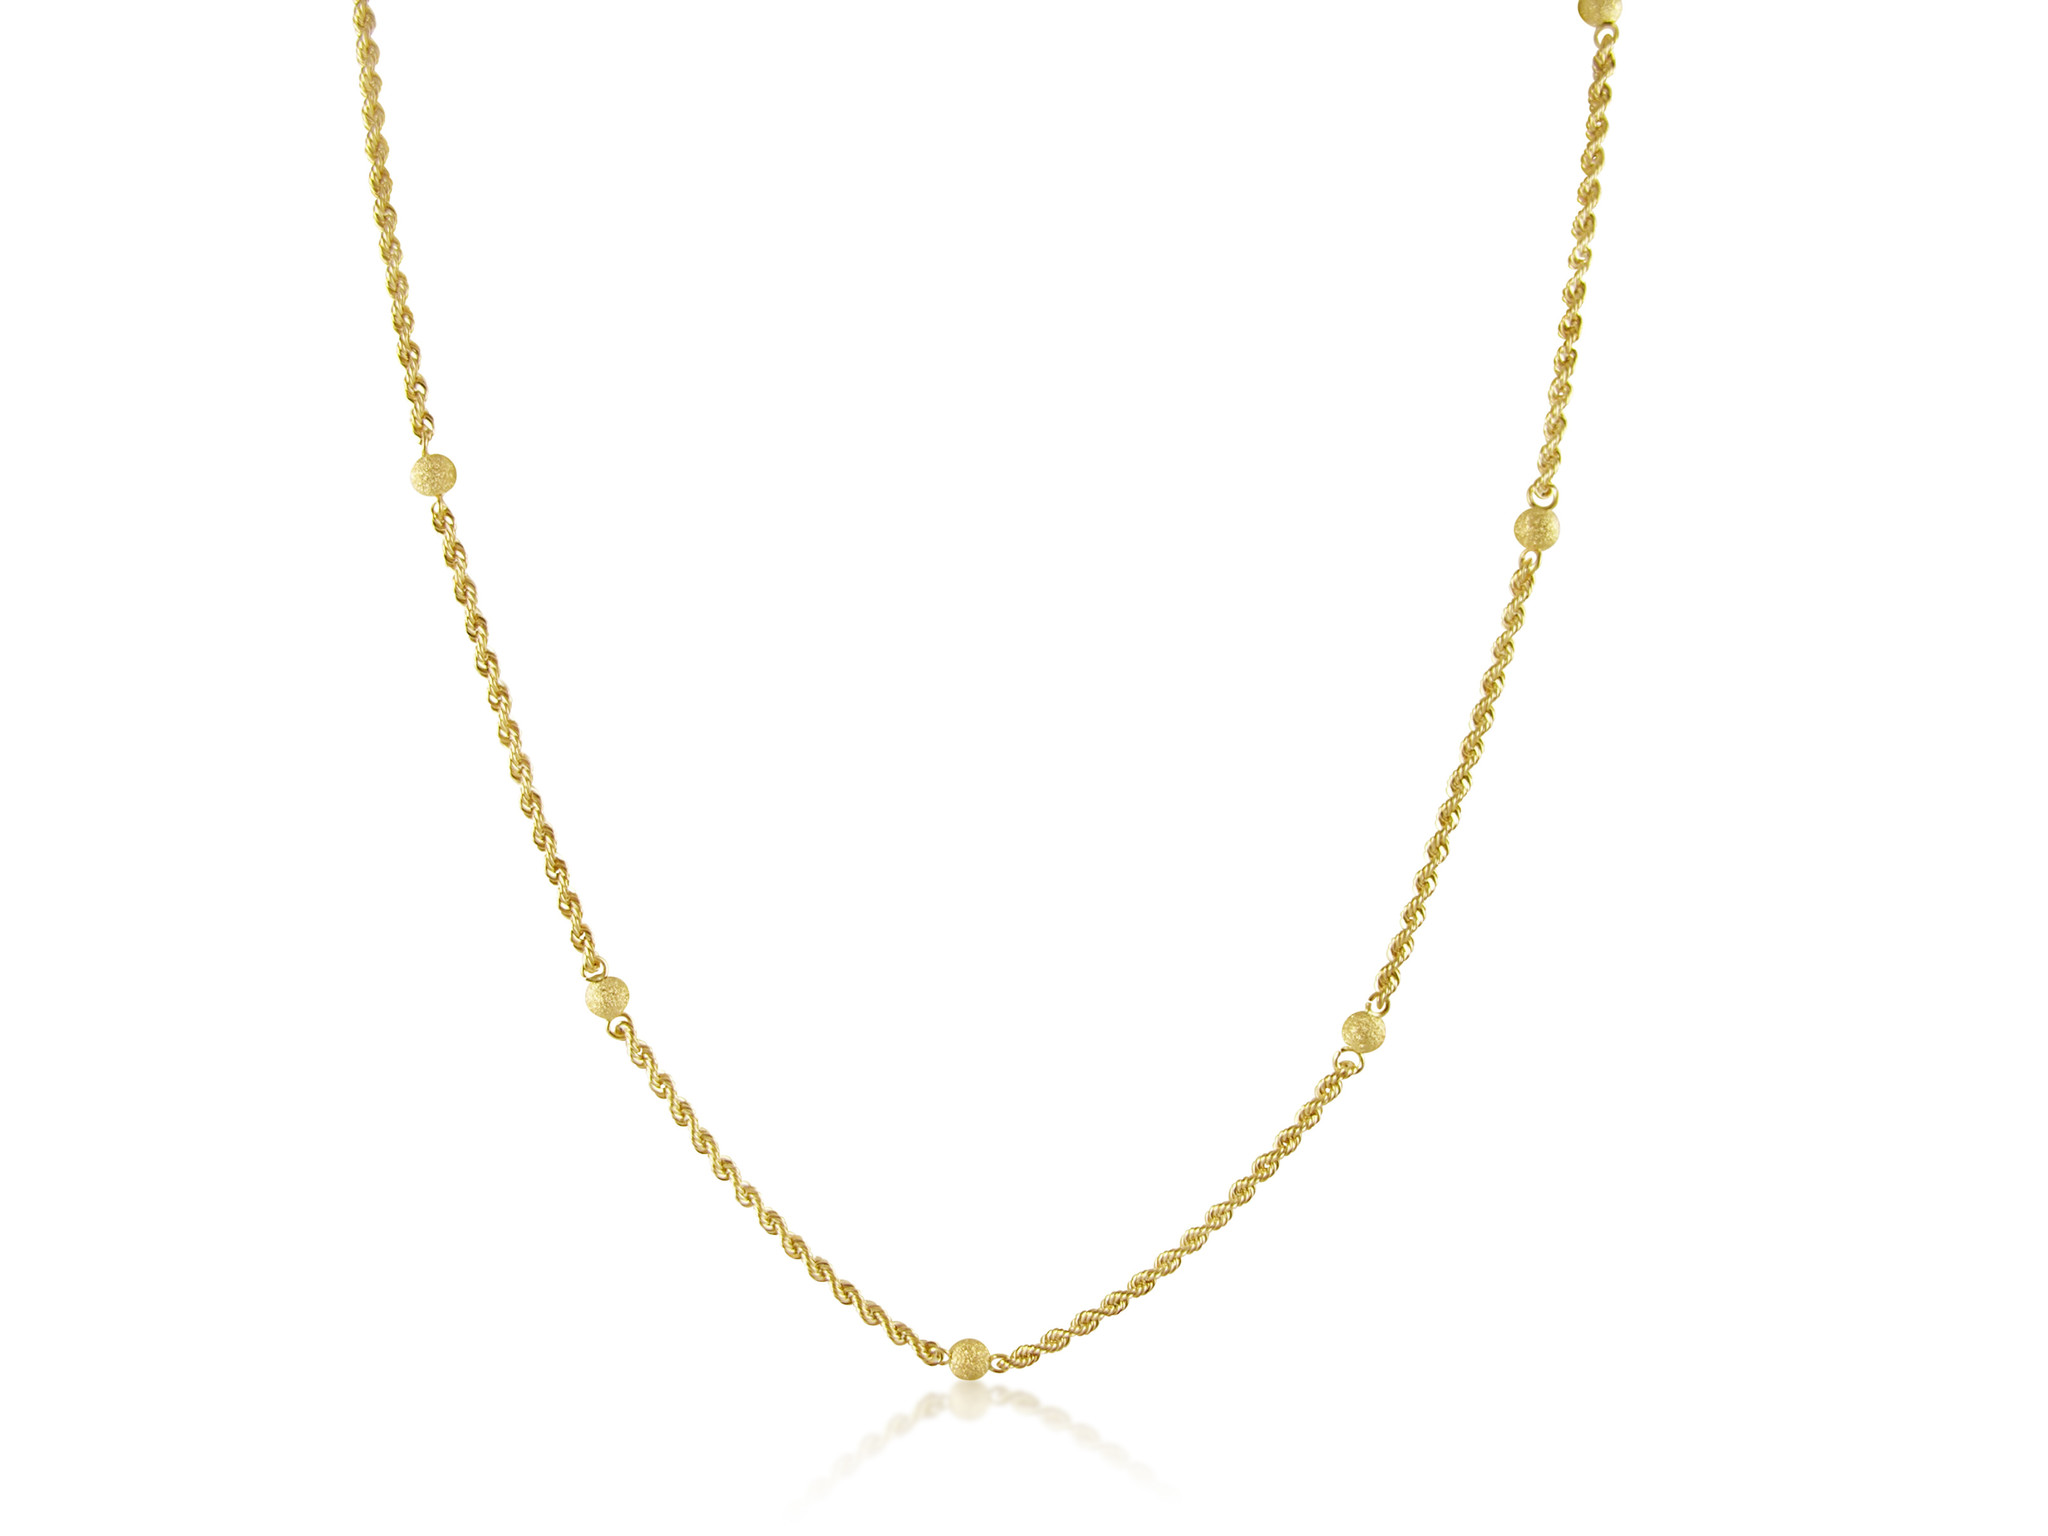 18 karaat geel goud touw ketting met bolletjes